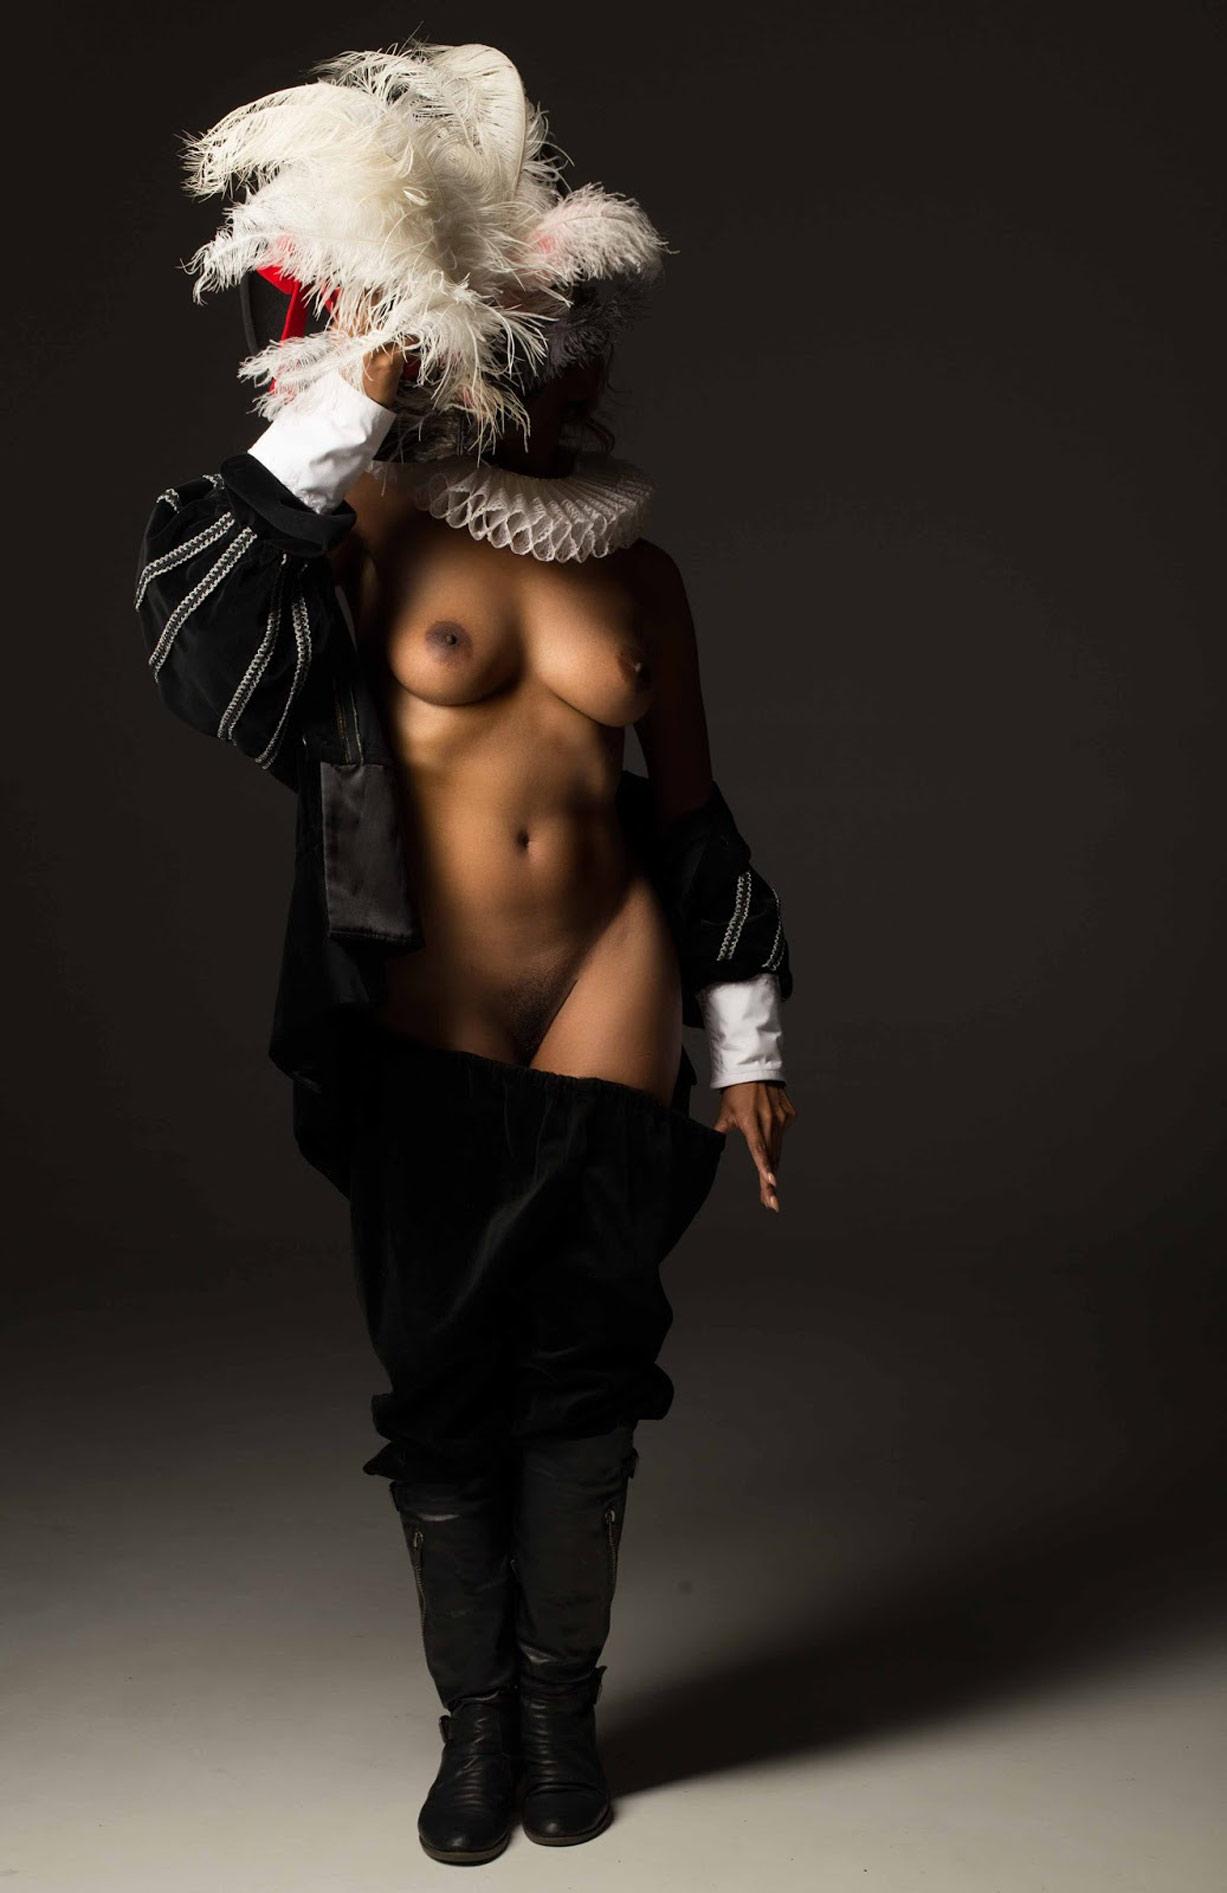 голый мушкетер / St.Merrique nude by Ben Ernst - Mousquetaire